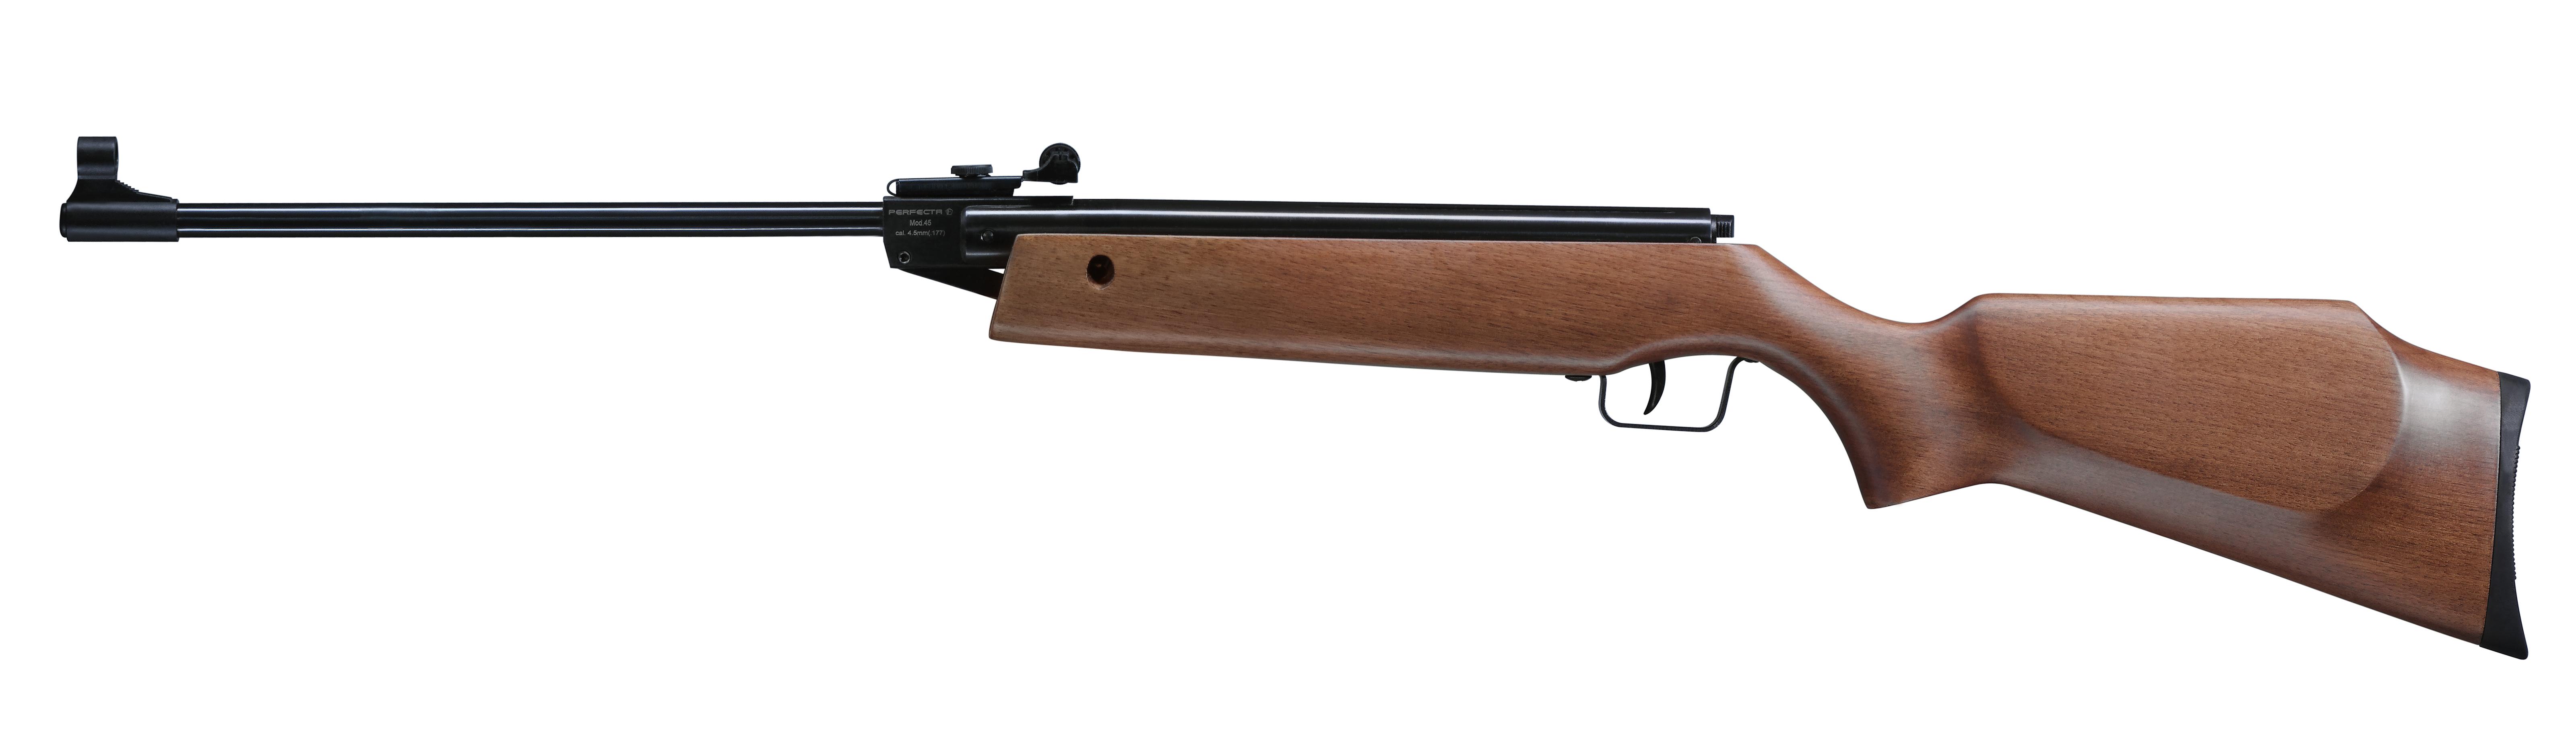 PERFECTA (Umarex) Spring Operated Airgun Model 45